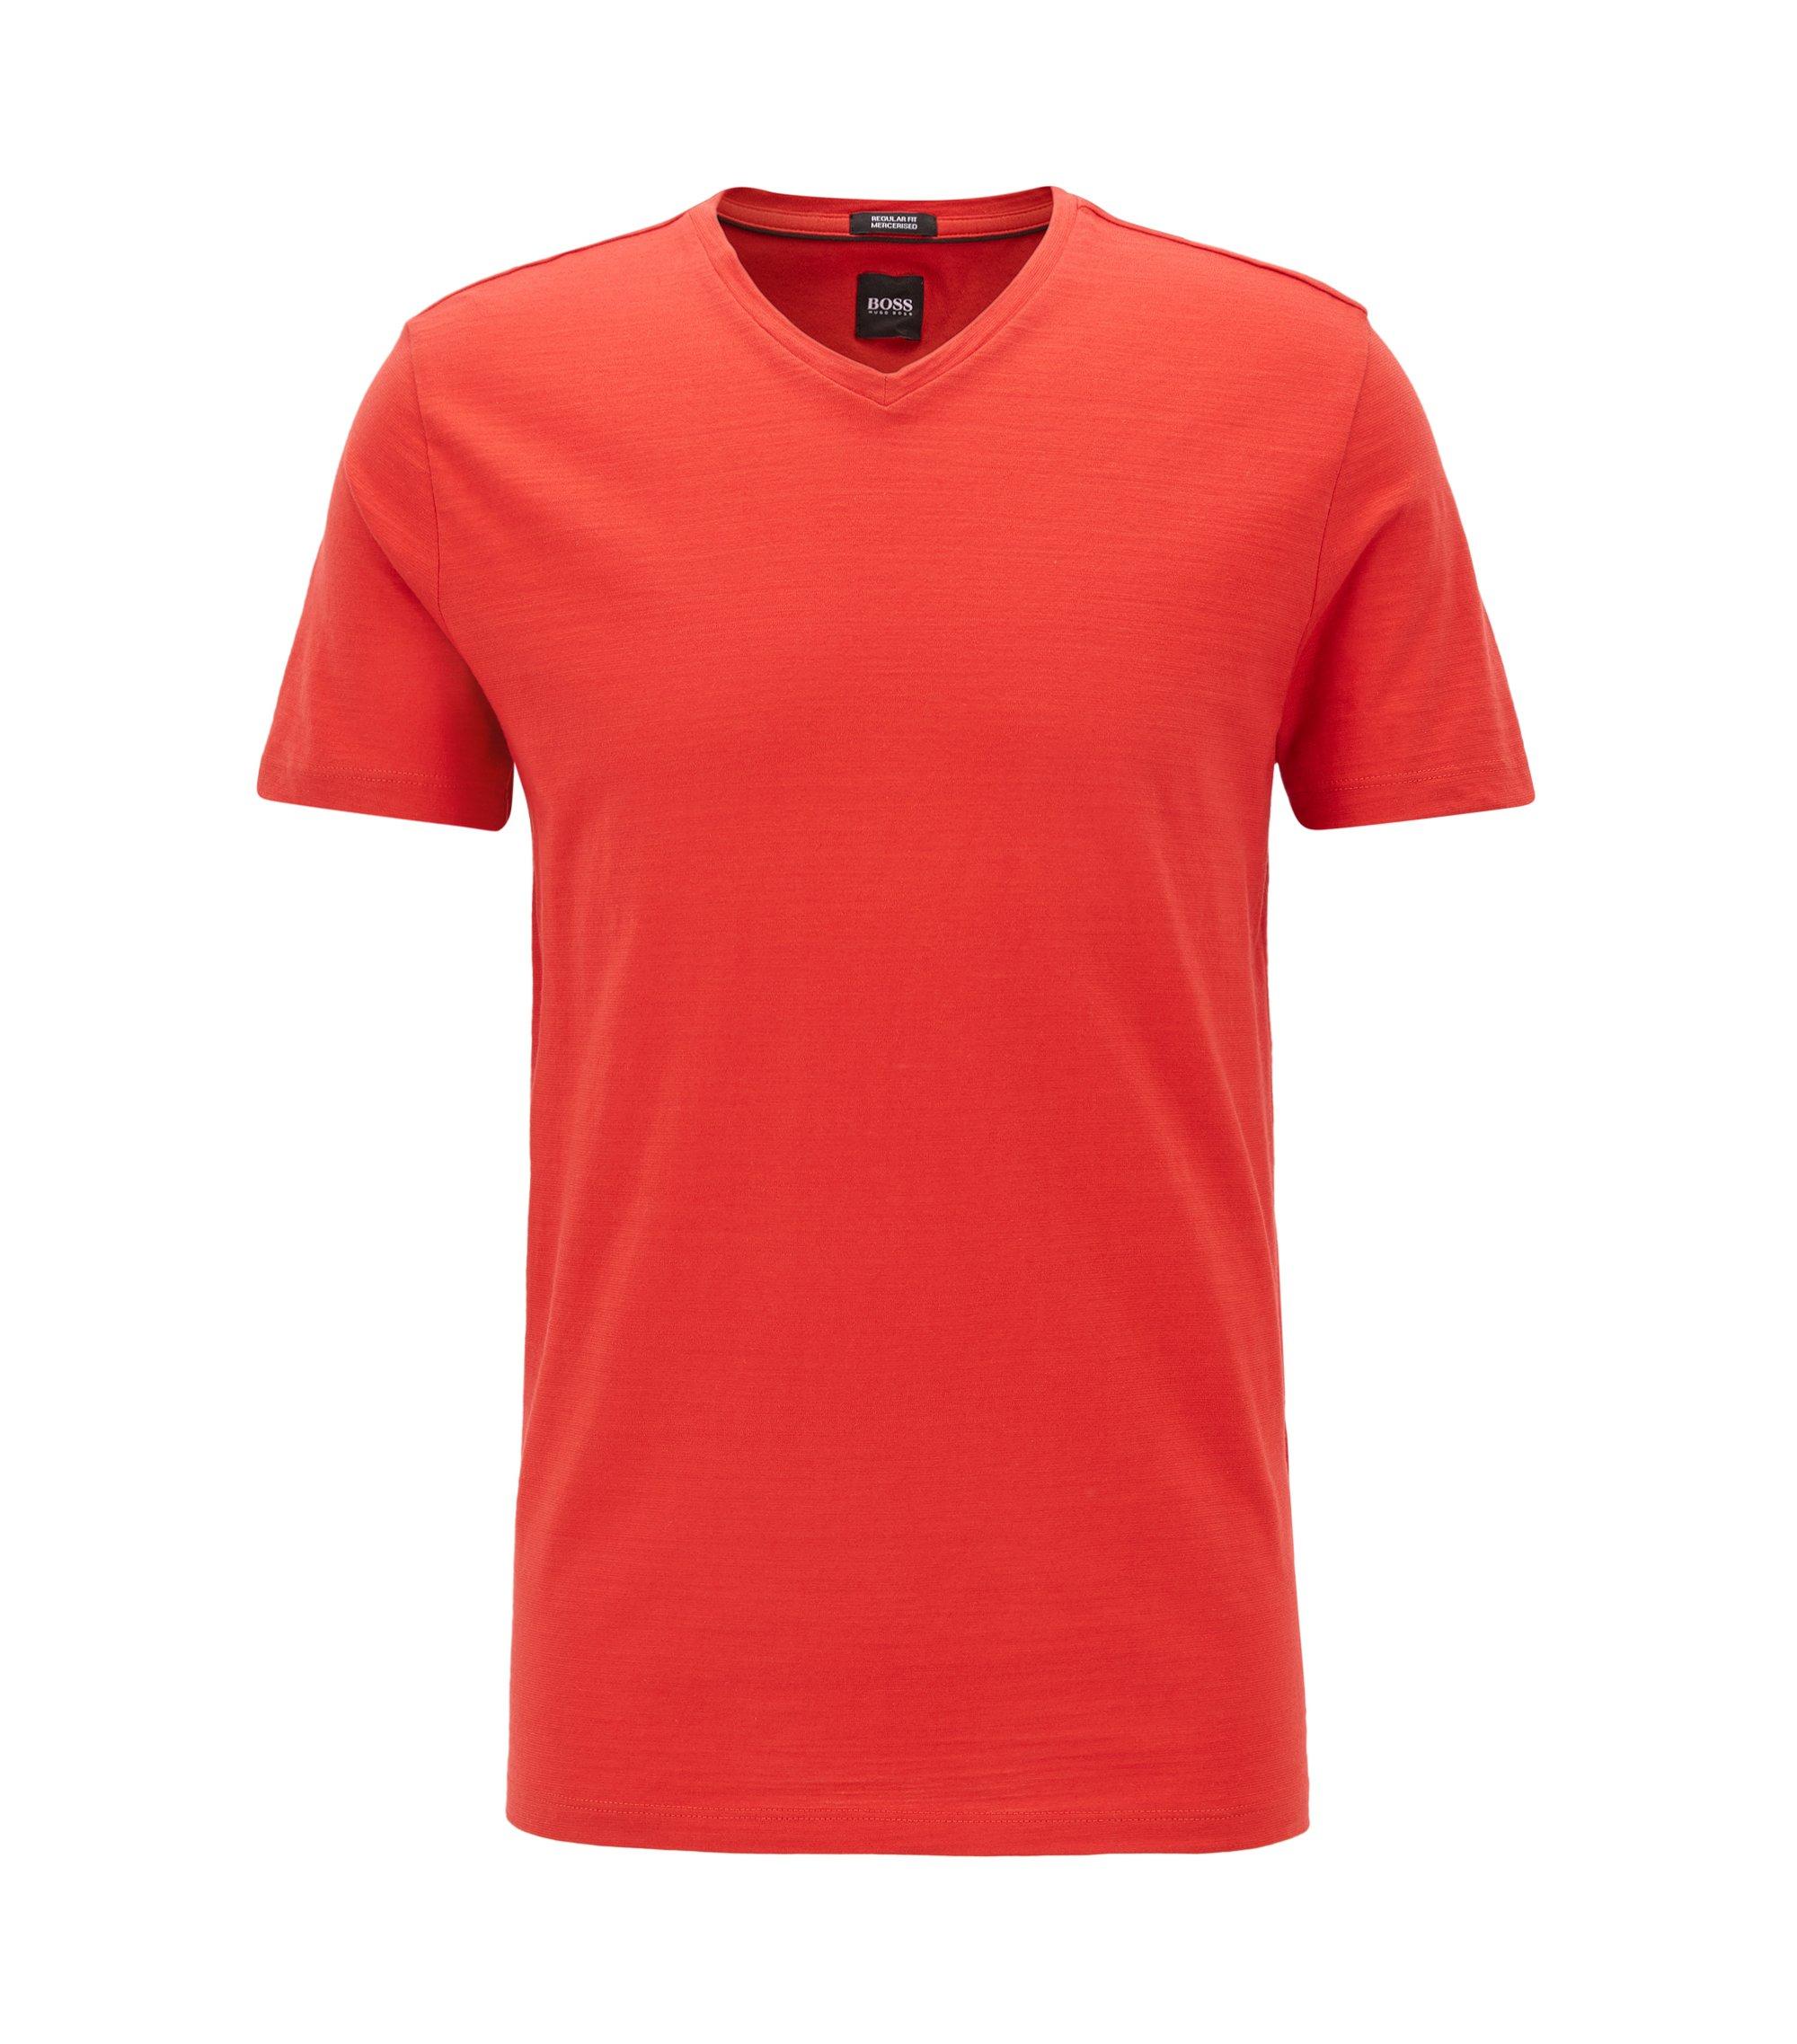 Regular-Fit T-Shirt aus merzerisierter Baumwolle, Rot